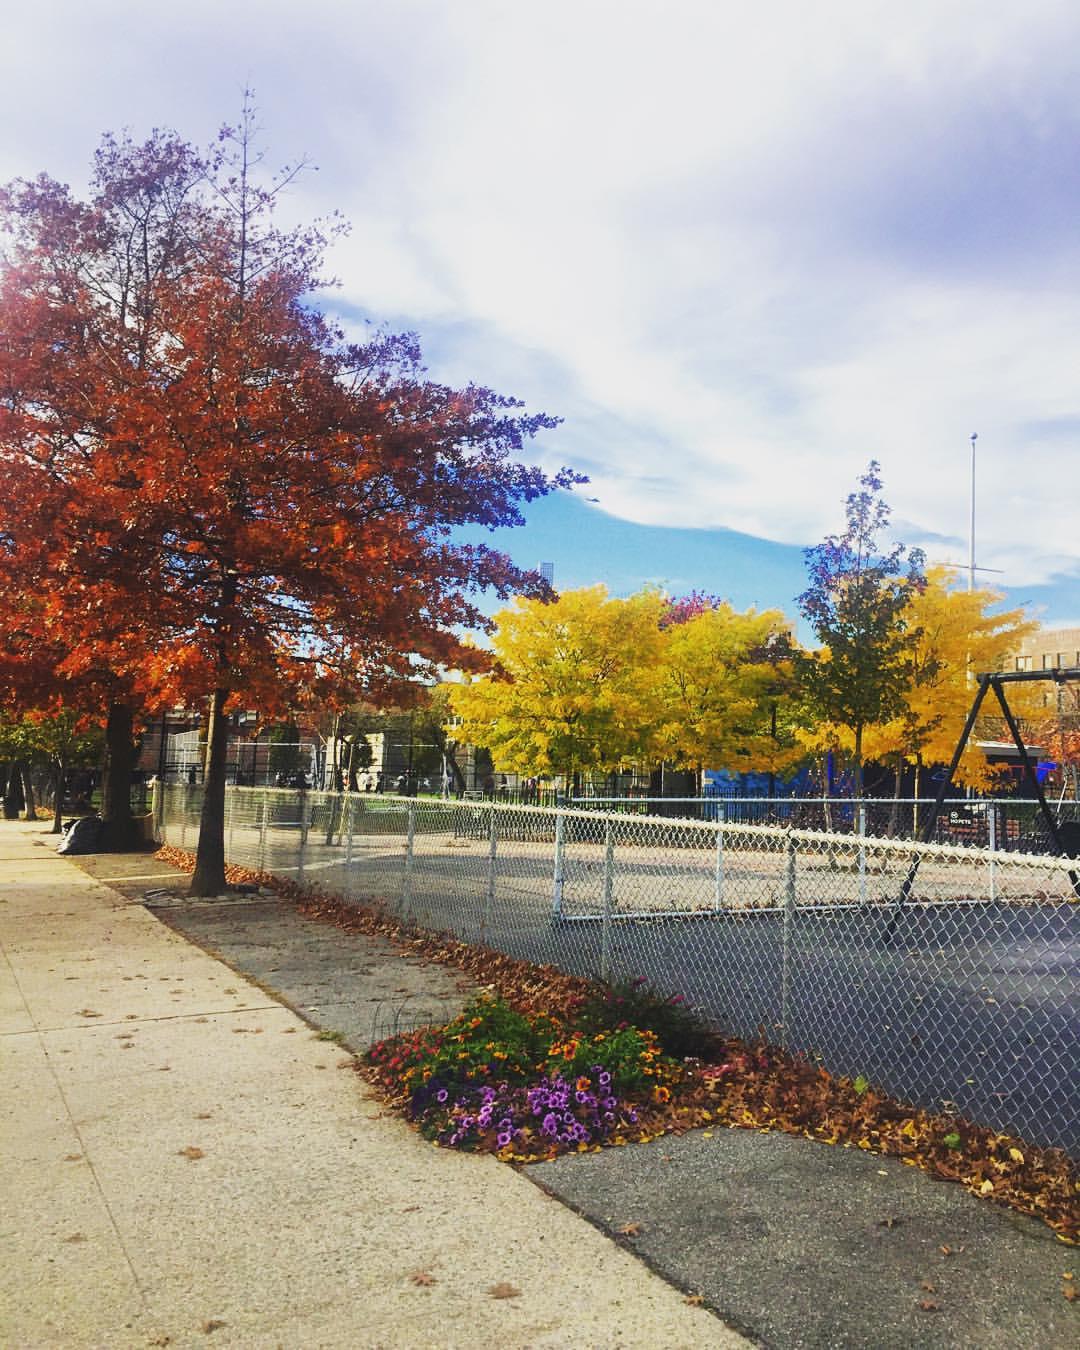 Yesterday's blue skies at John F Murray playground in Long Island City 🍁)